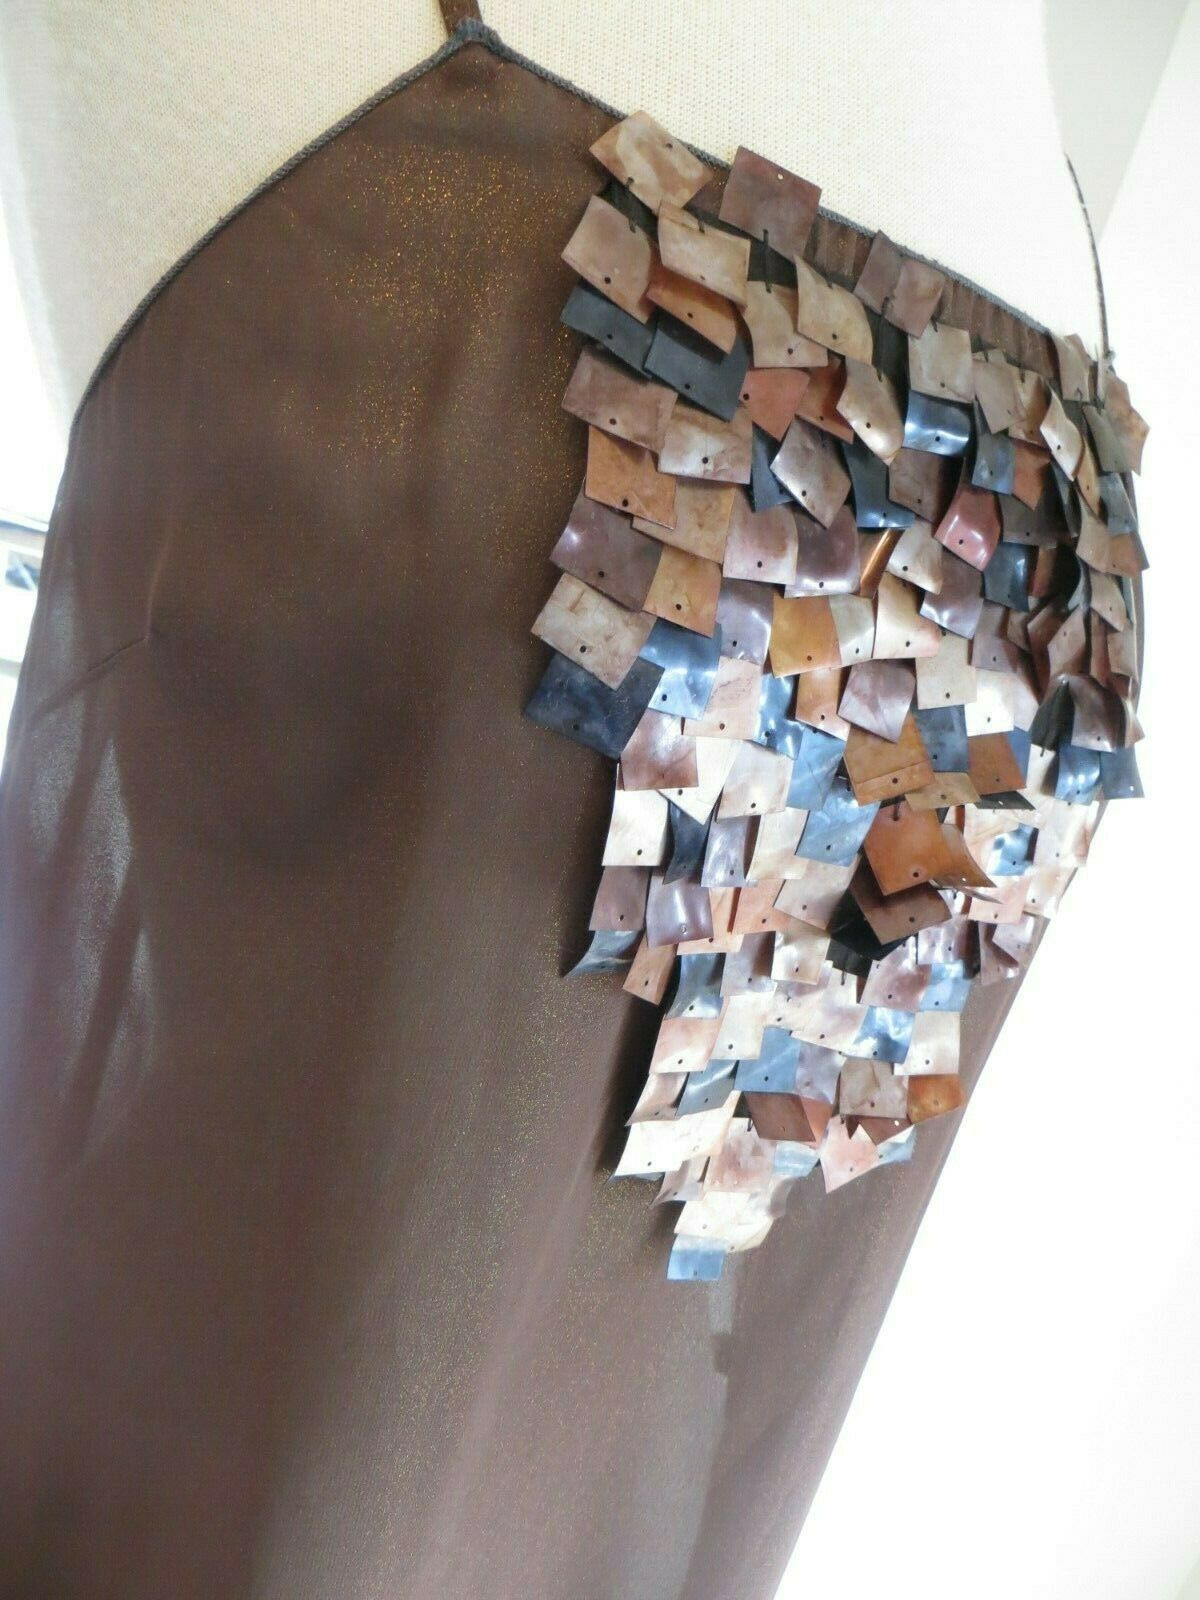 NEW Womens Rozae Nichols Sheer Embellished Tank Brown Top Size M   STUNNING